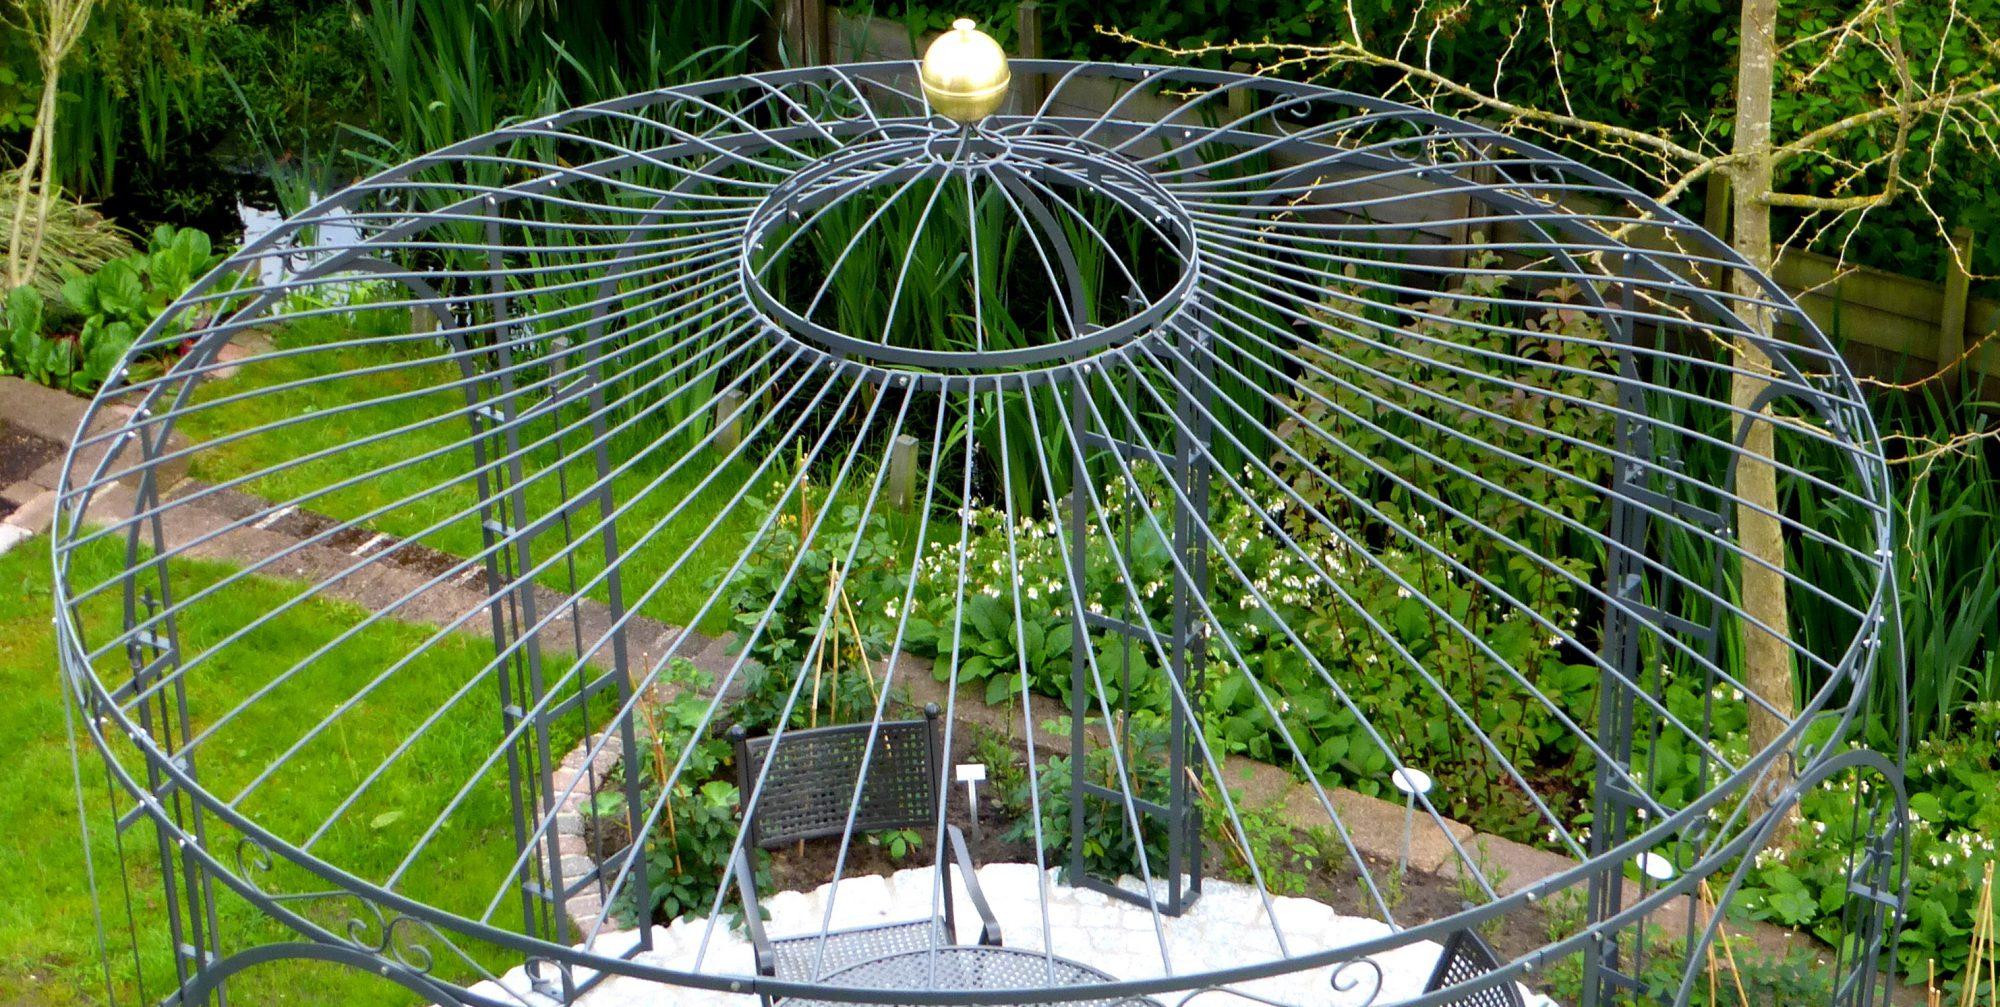 Full Size of Eisenpavillons Stabil Langlebig Online Kaufen Bei Eleo Garten Pavillon Wohnzimmer Pavillon Eisen